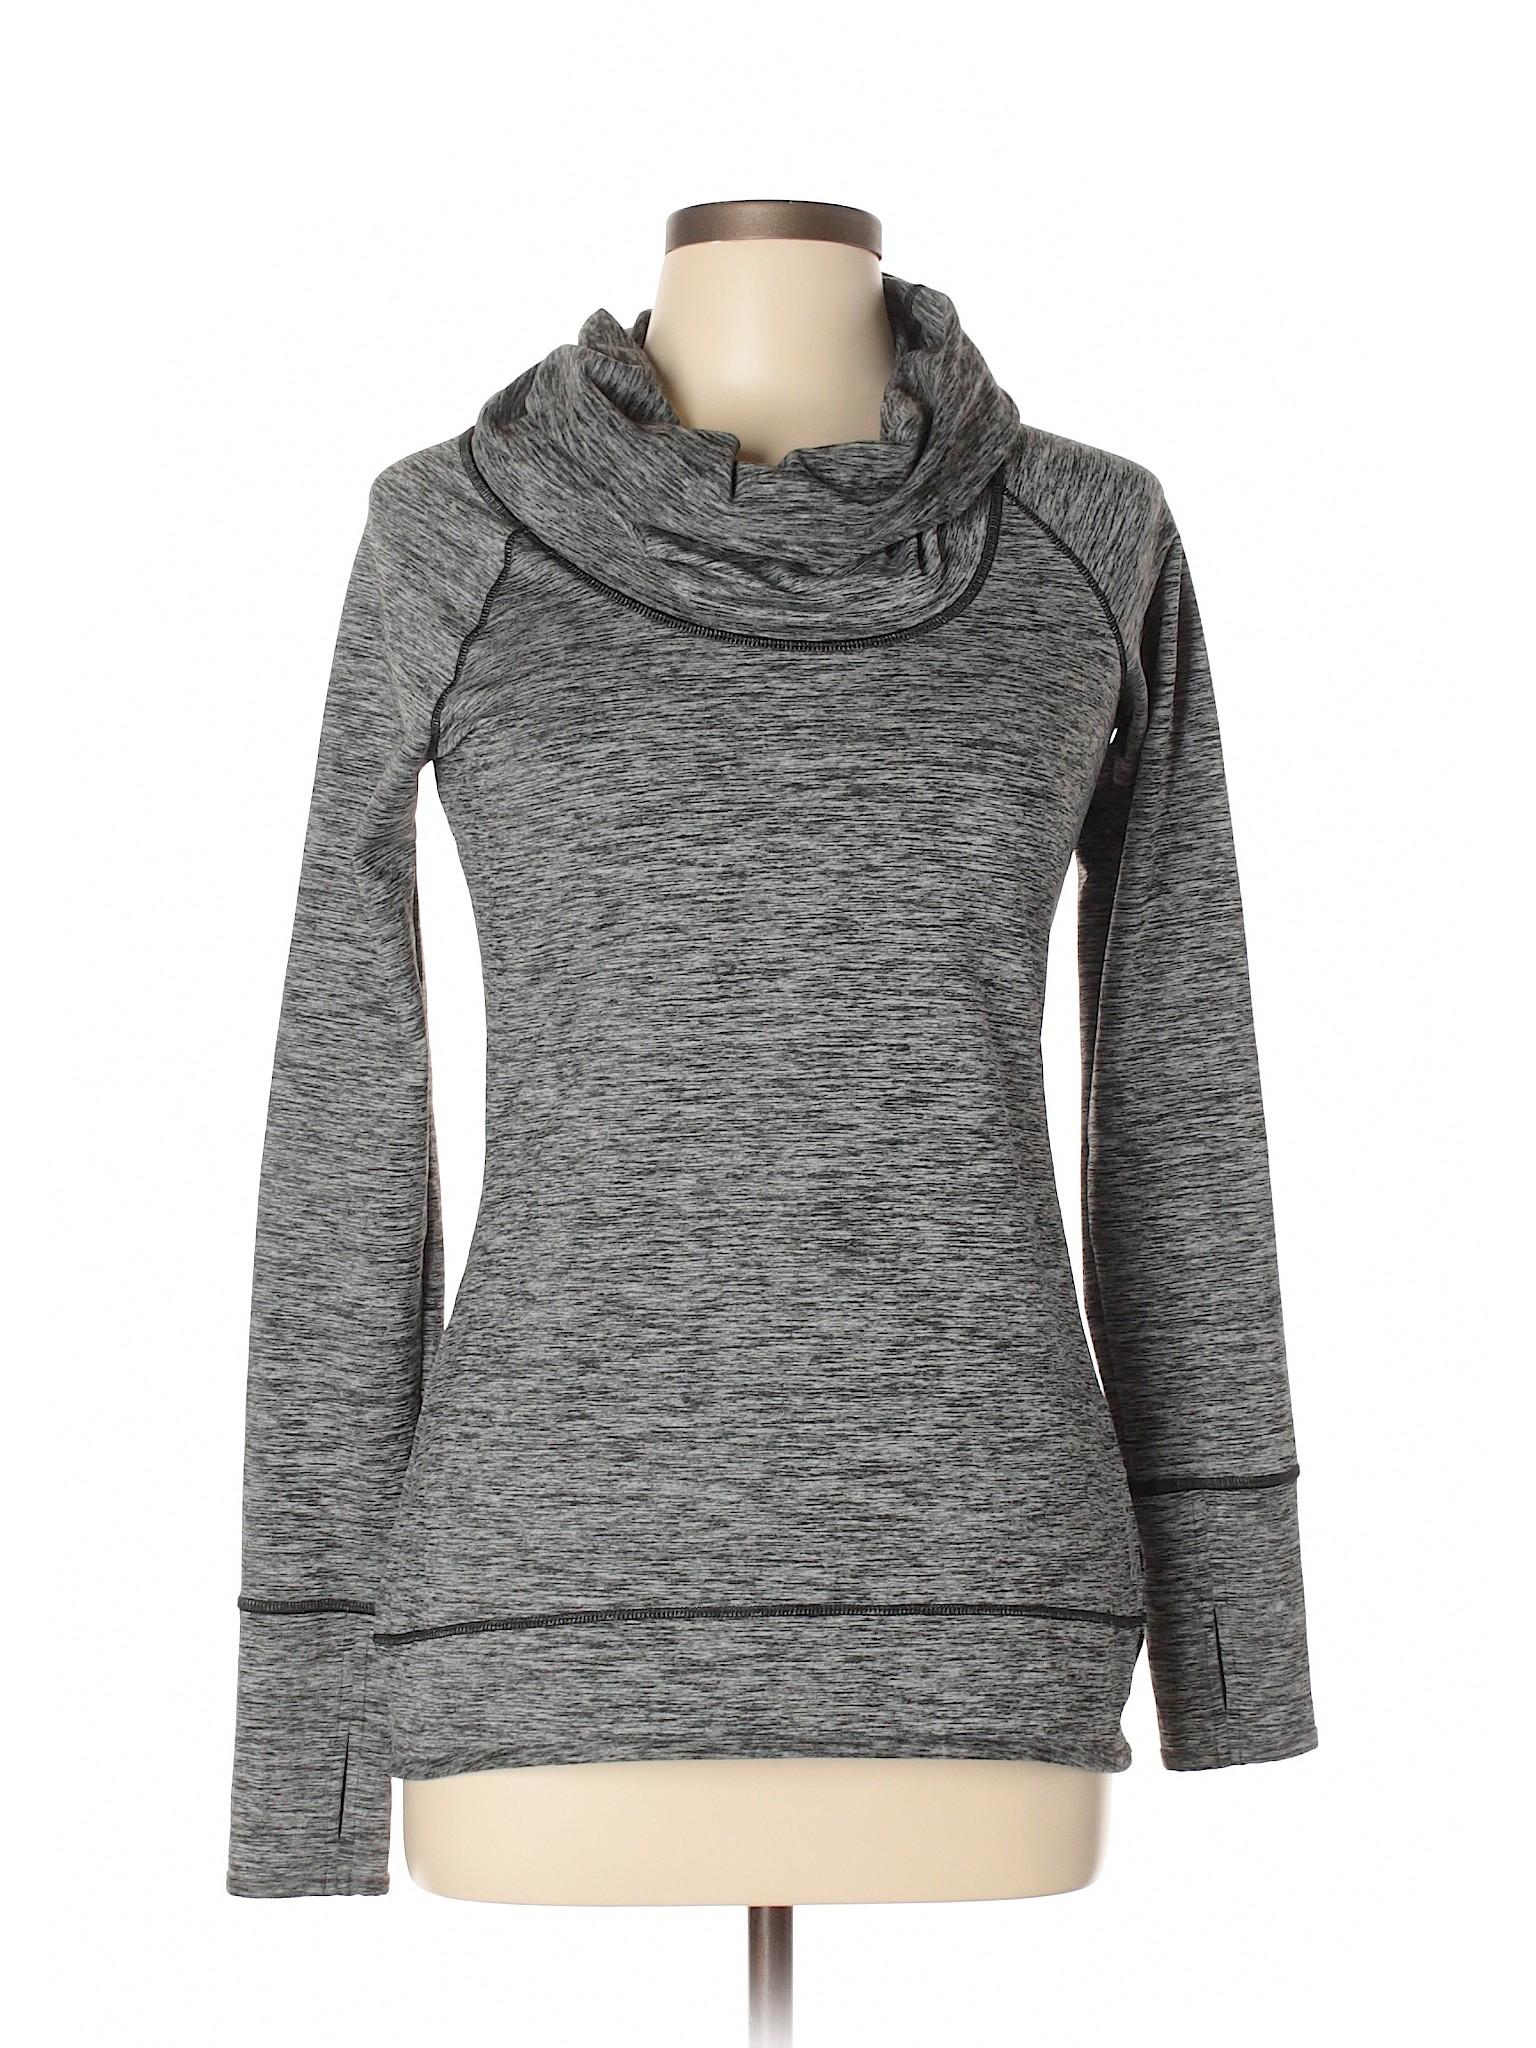 Boutique winter Pullover Pullover Boutique Sweater Boutique Reebok winter Pullover Sweater Reebok Sweater winter Reebok TYxxCq